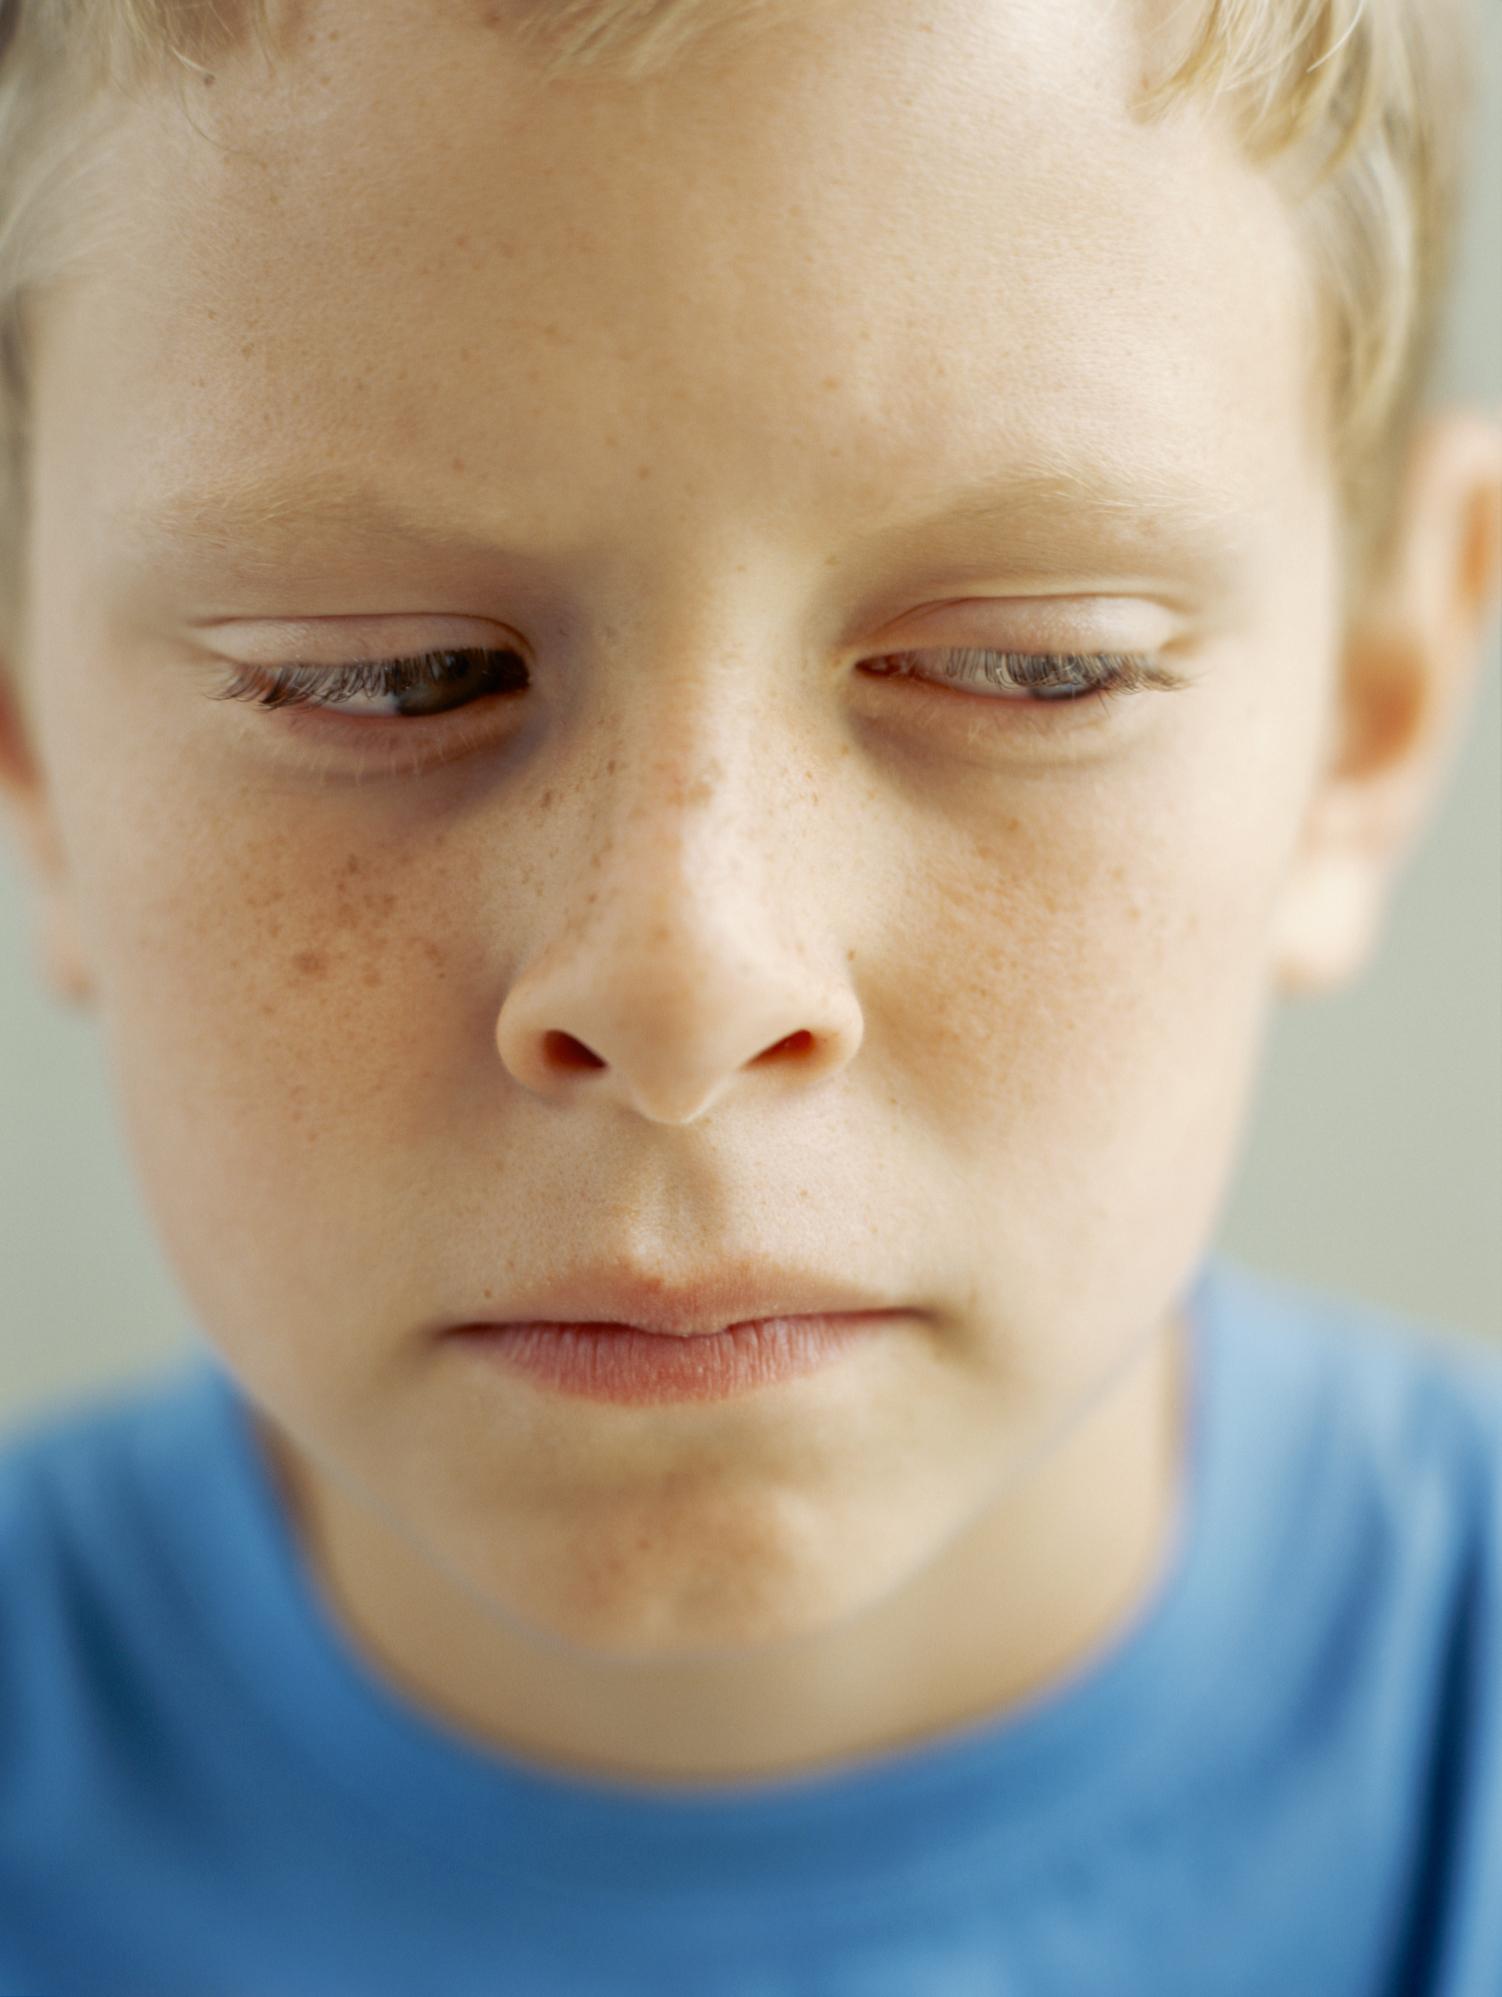 Shirt Biting Behavioral Problems in Autistic Children